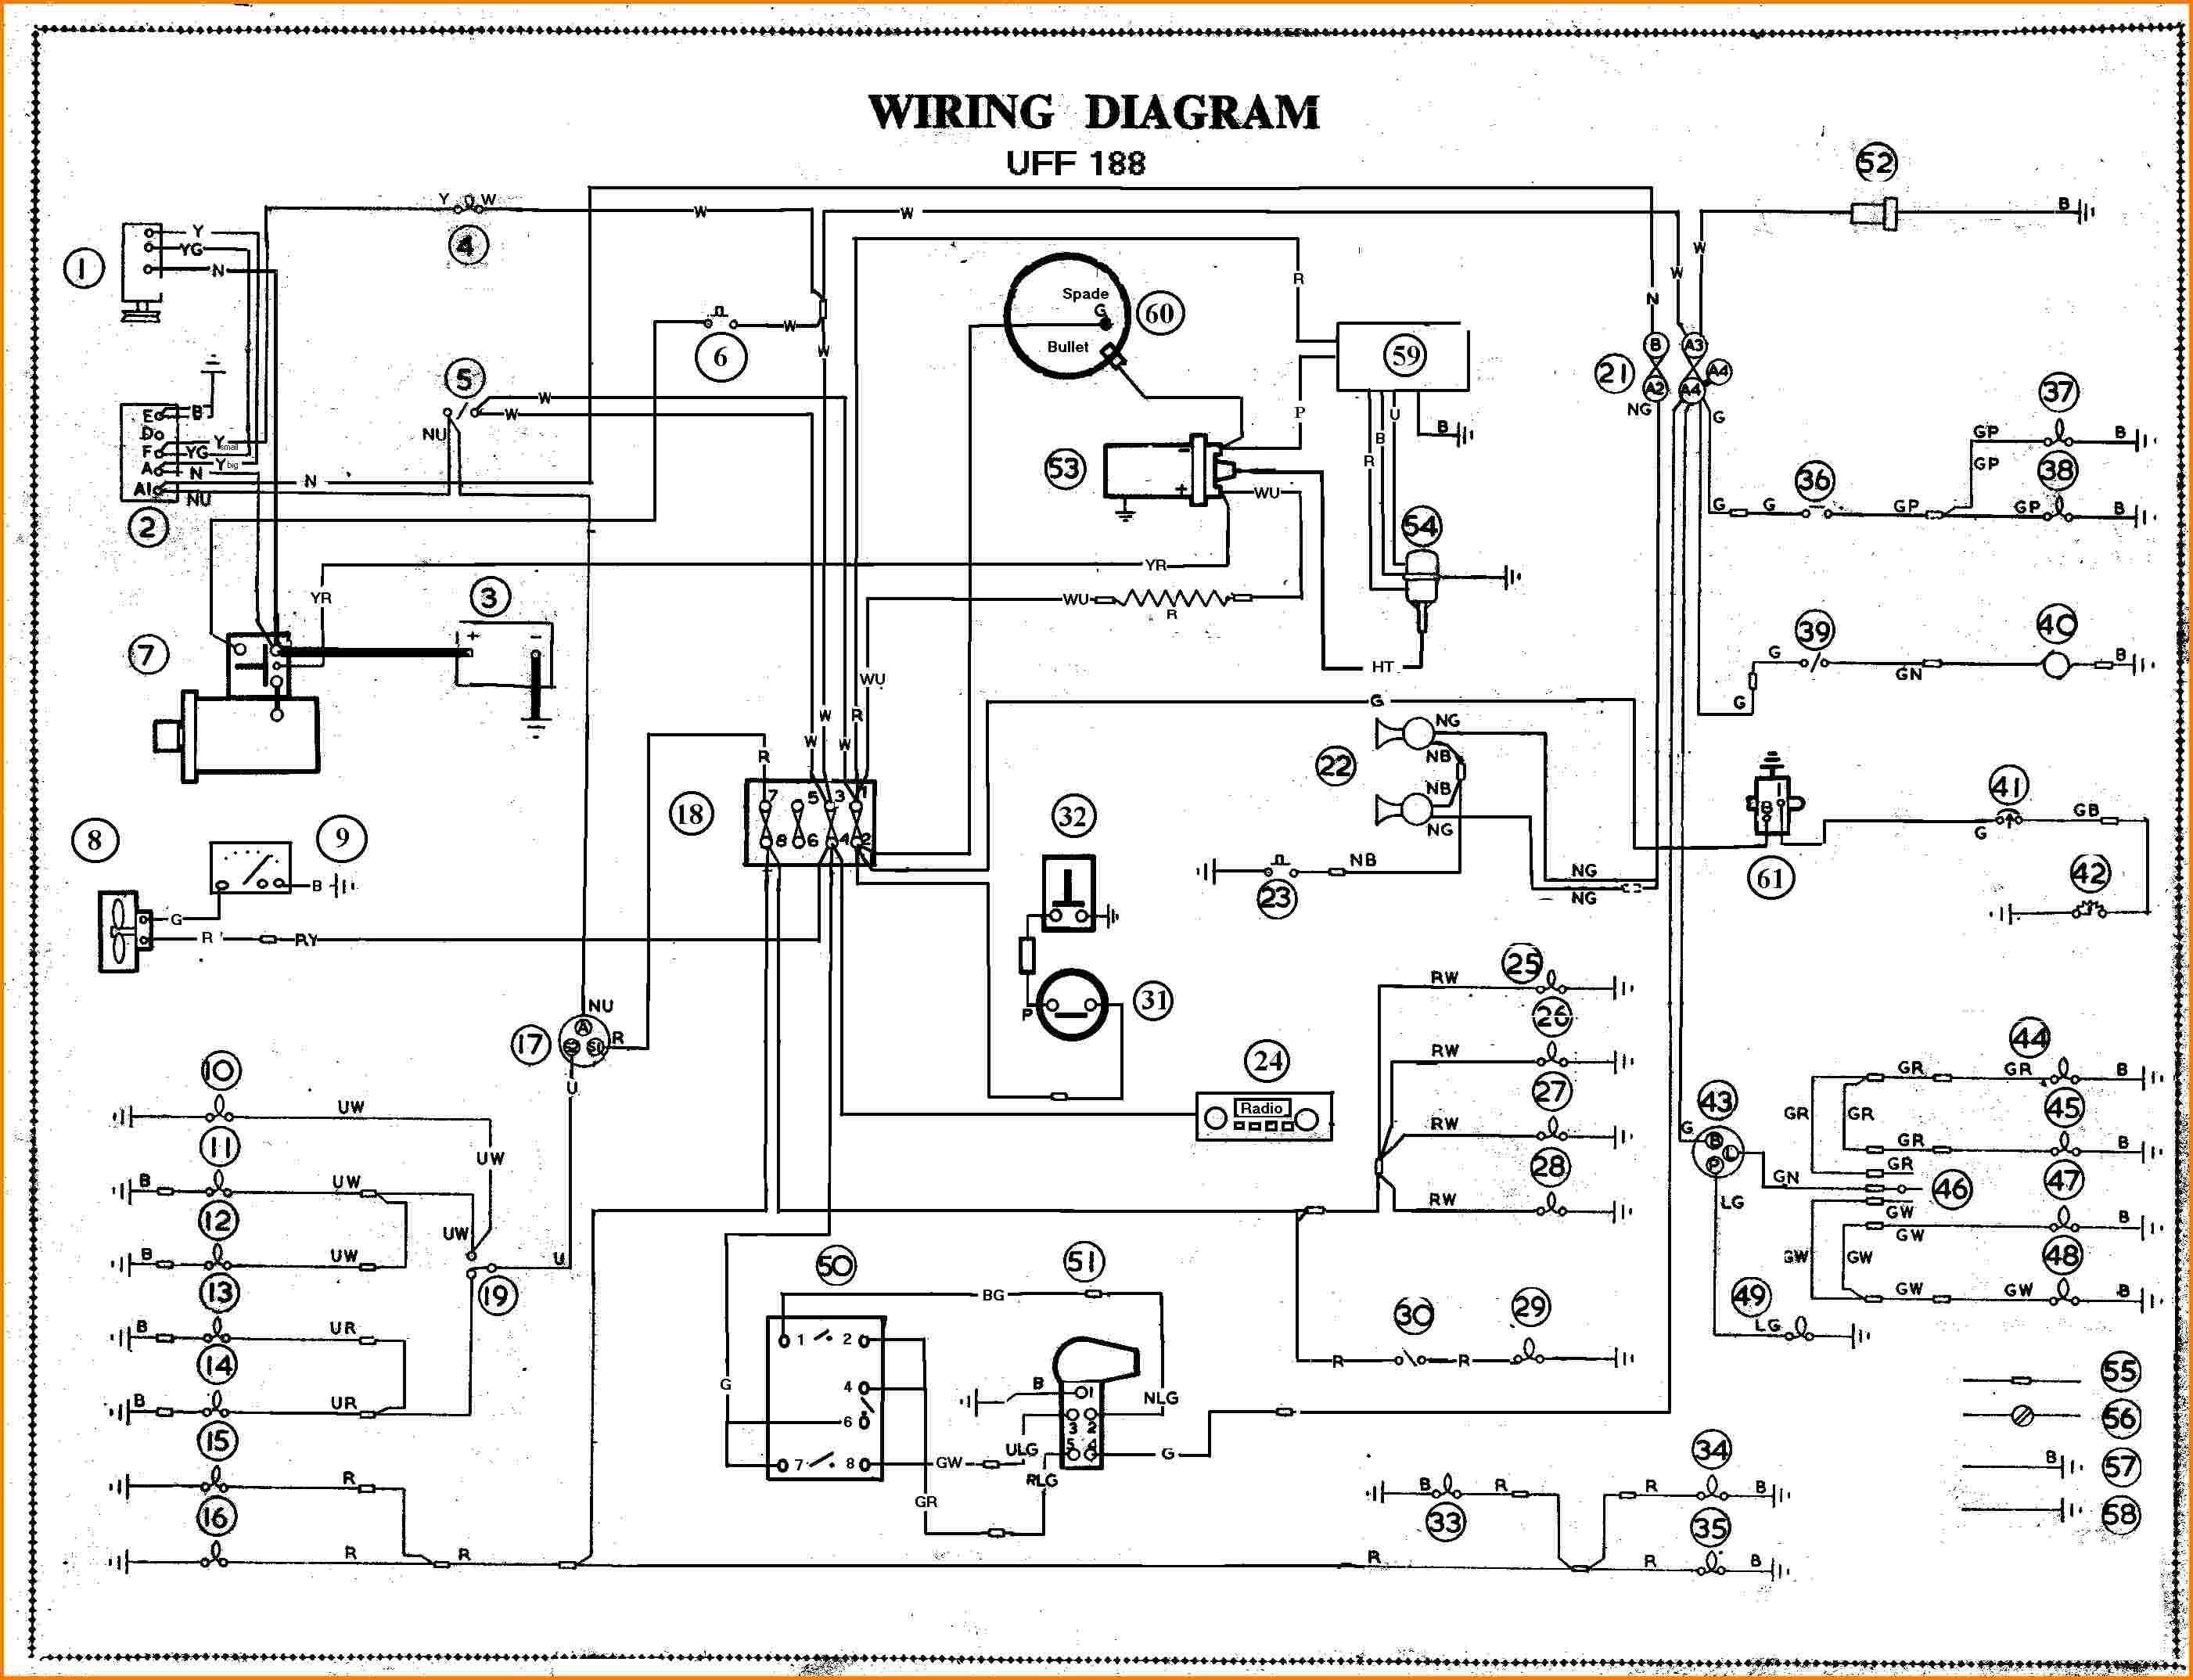 Race Car Wiring Diagram Car Diagram Drag Race Car Wiring Diagram Schematic Best Sample